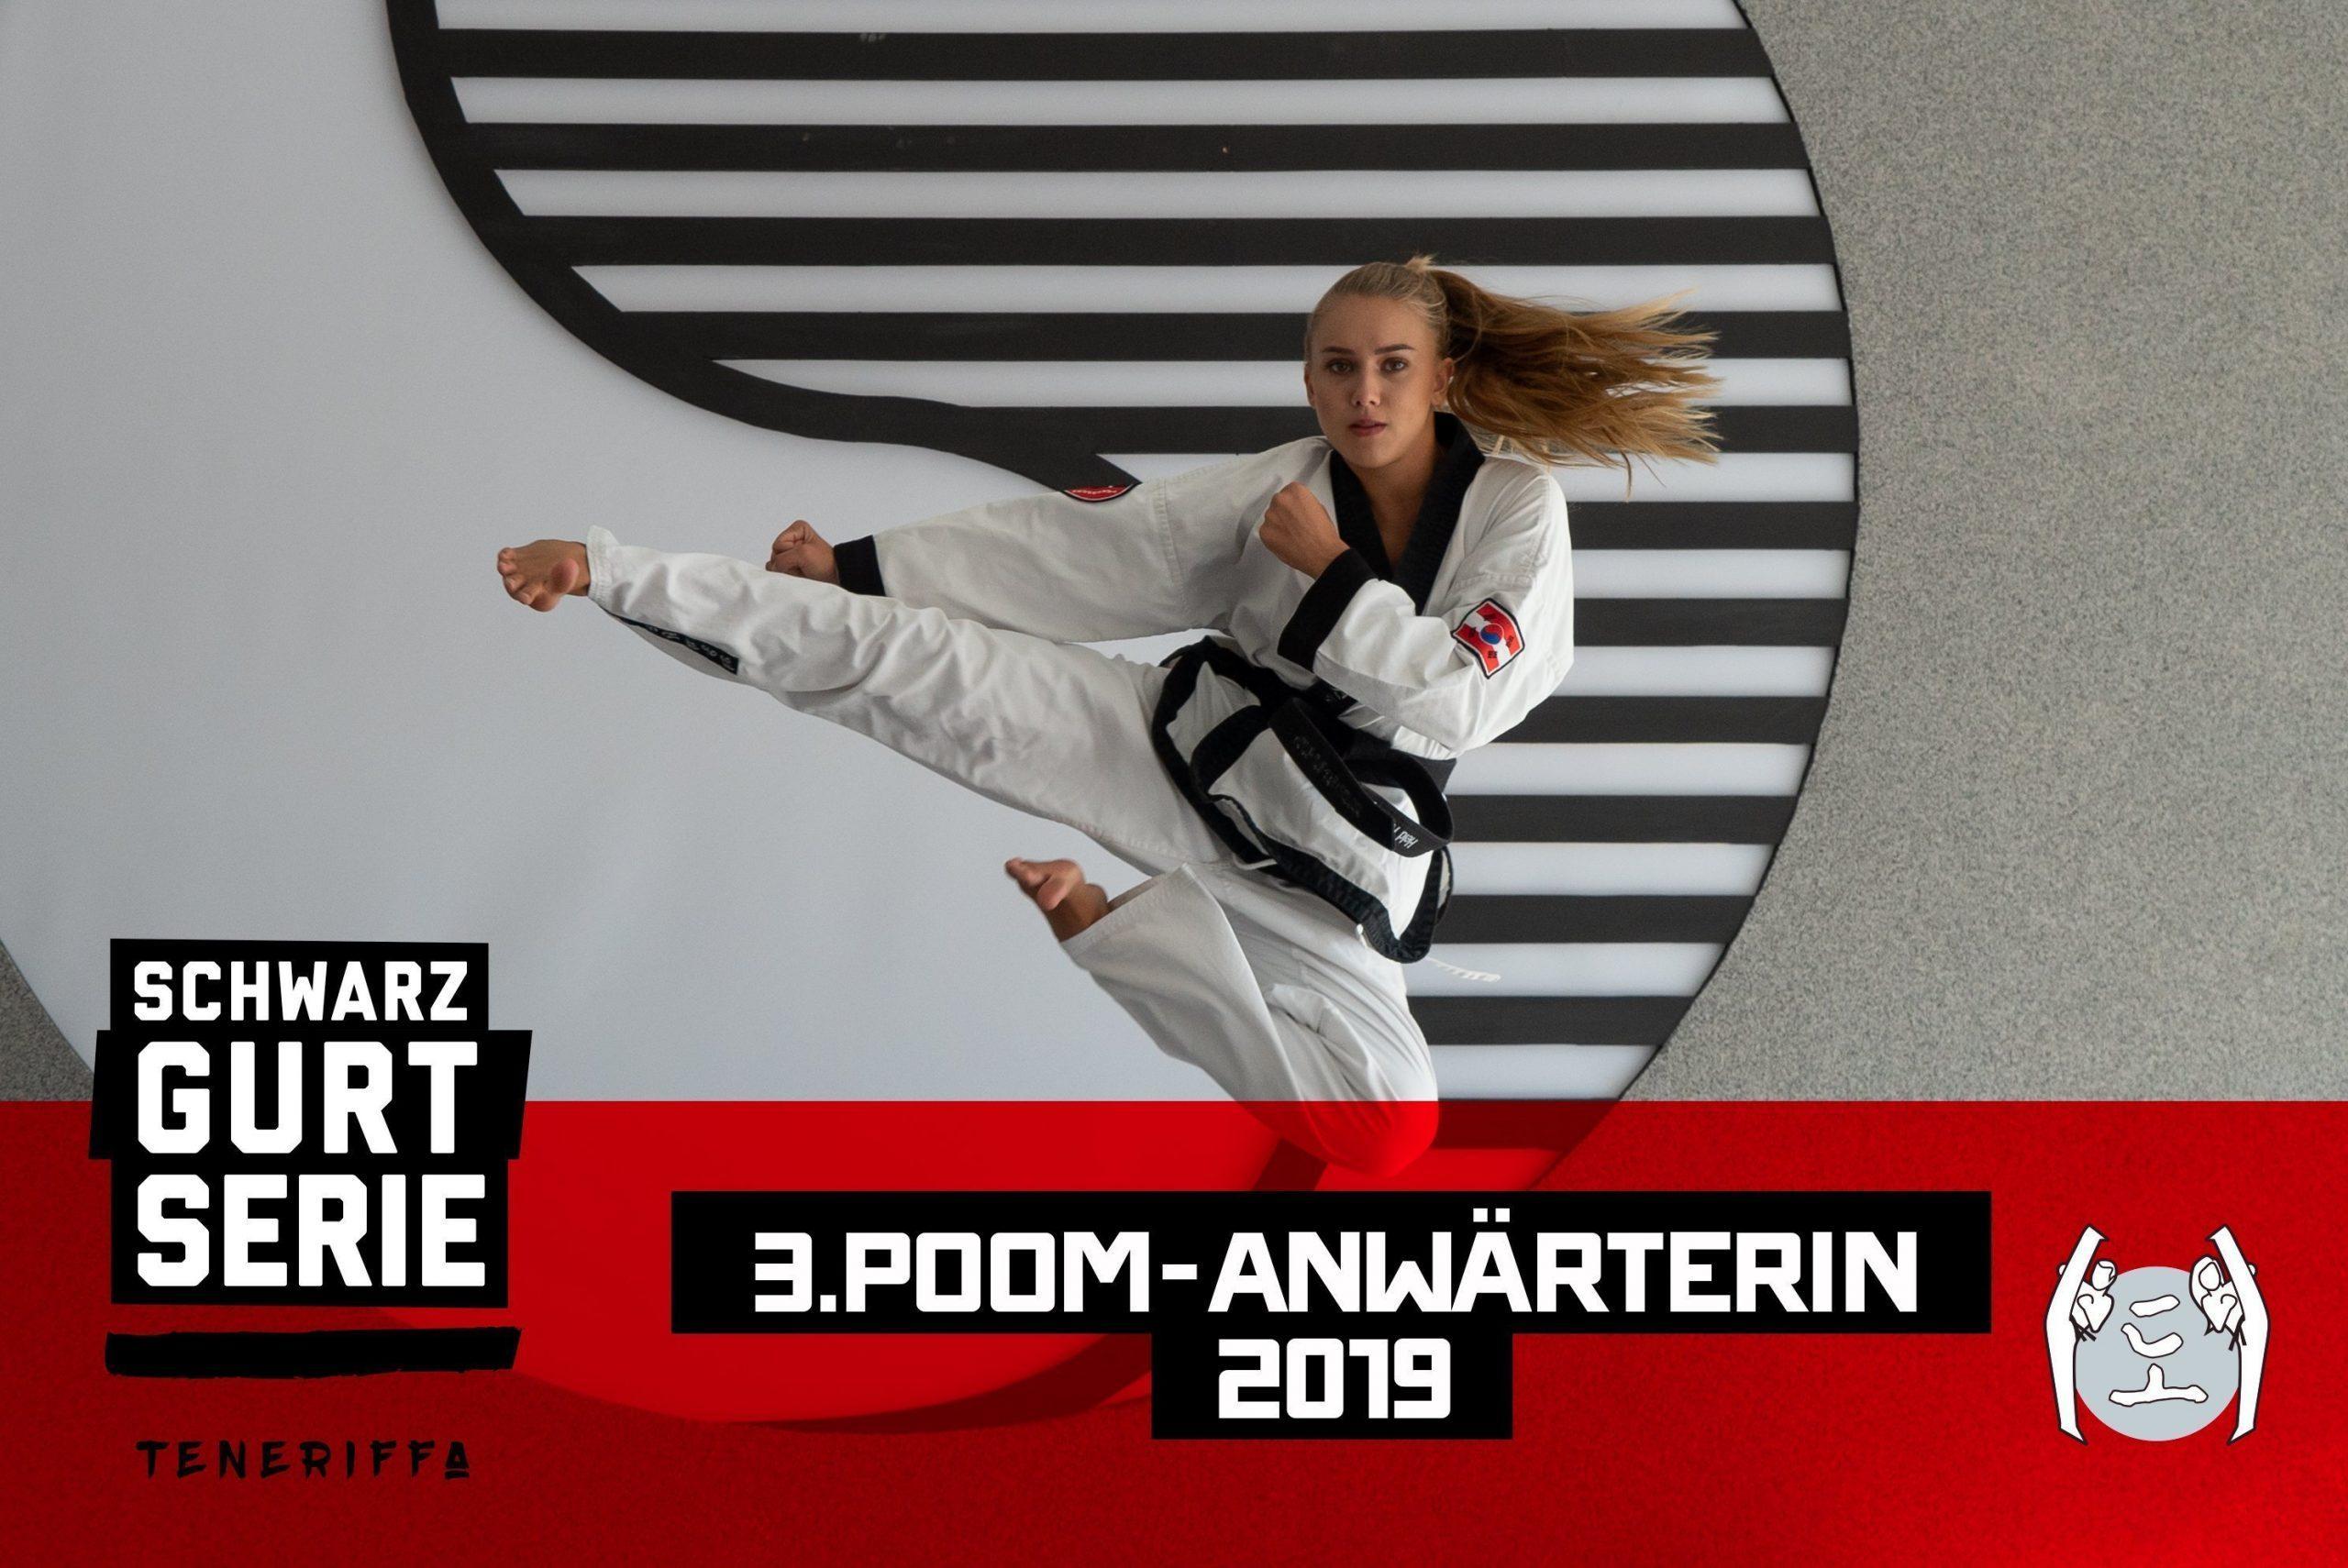 YOUNG-UNG Taekwondo Kampfsport Celine Held 3. POOM Anwärterin Teneriffa Training Camp